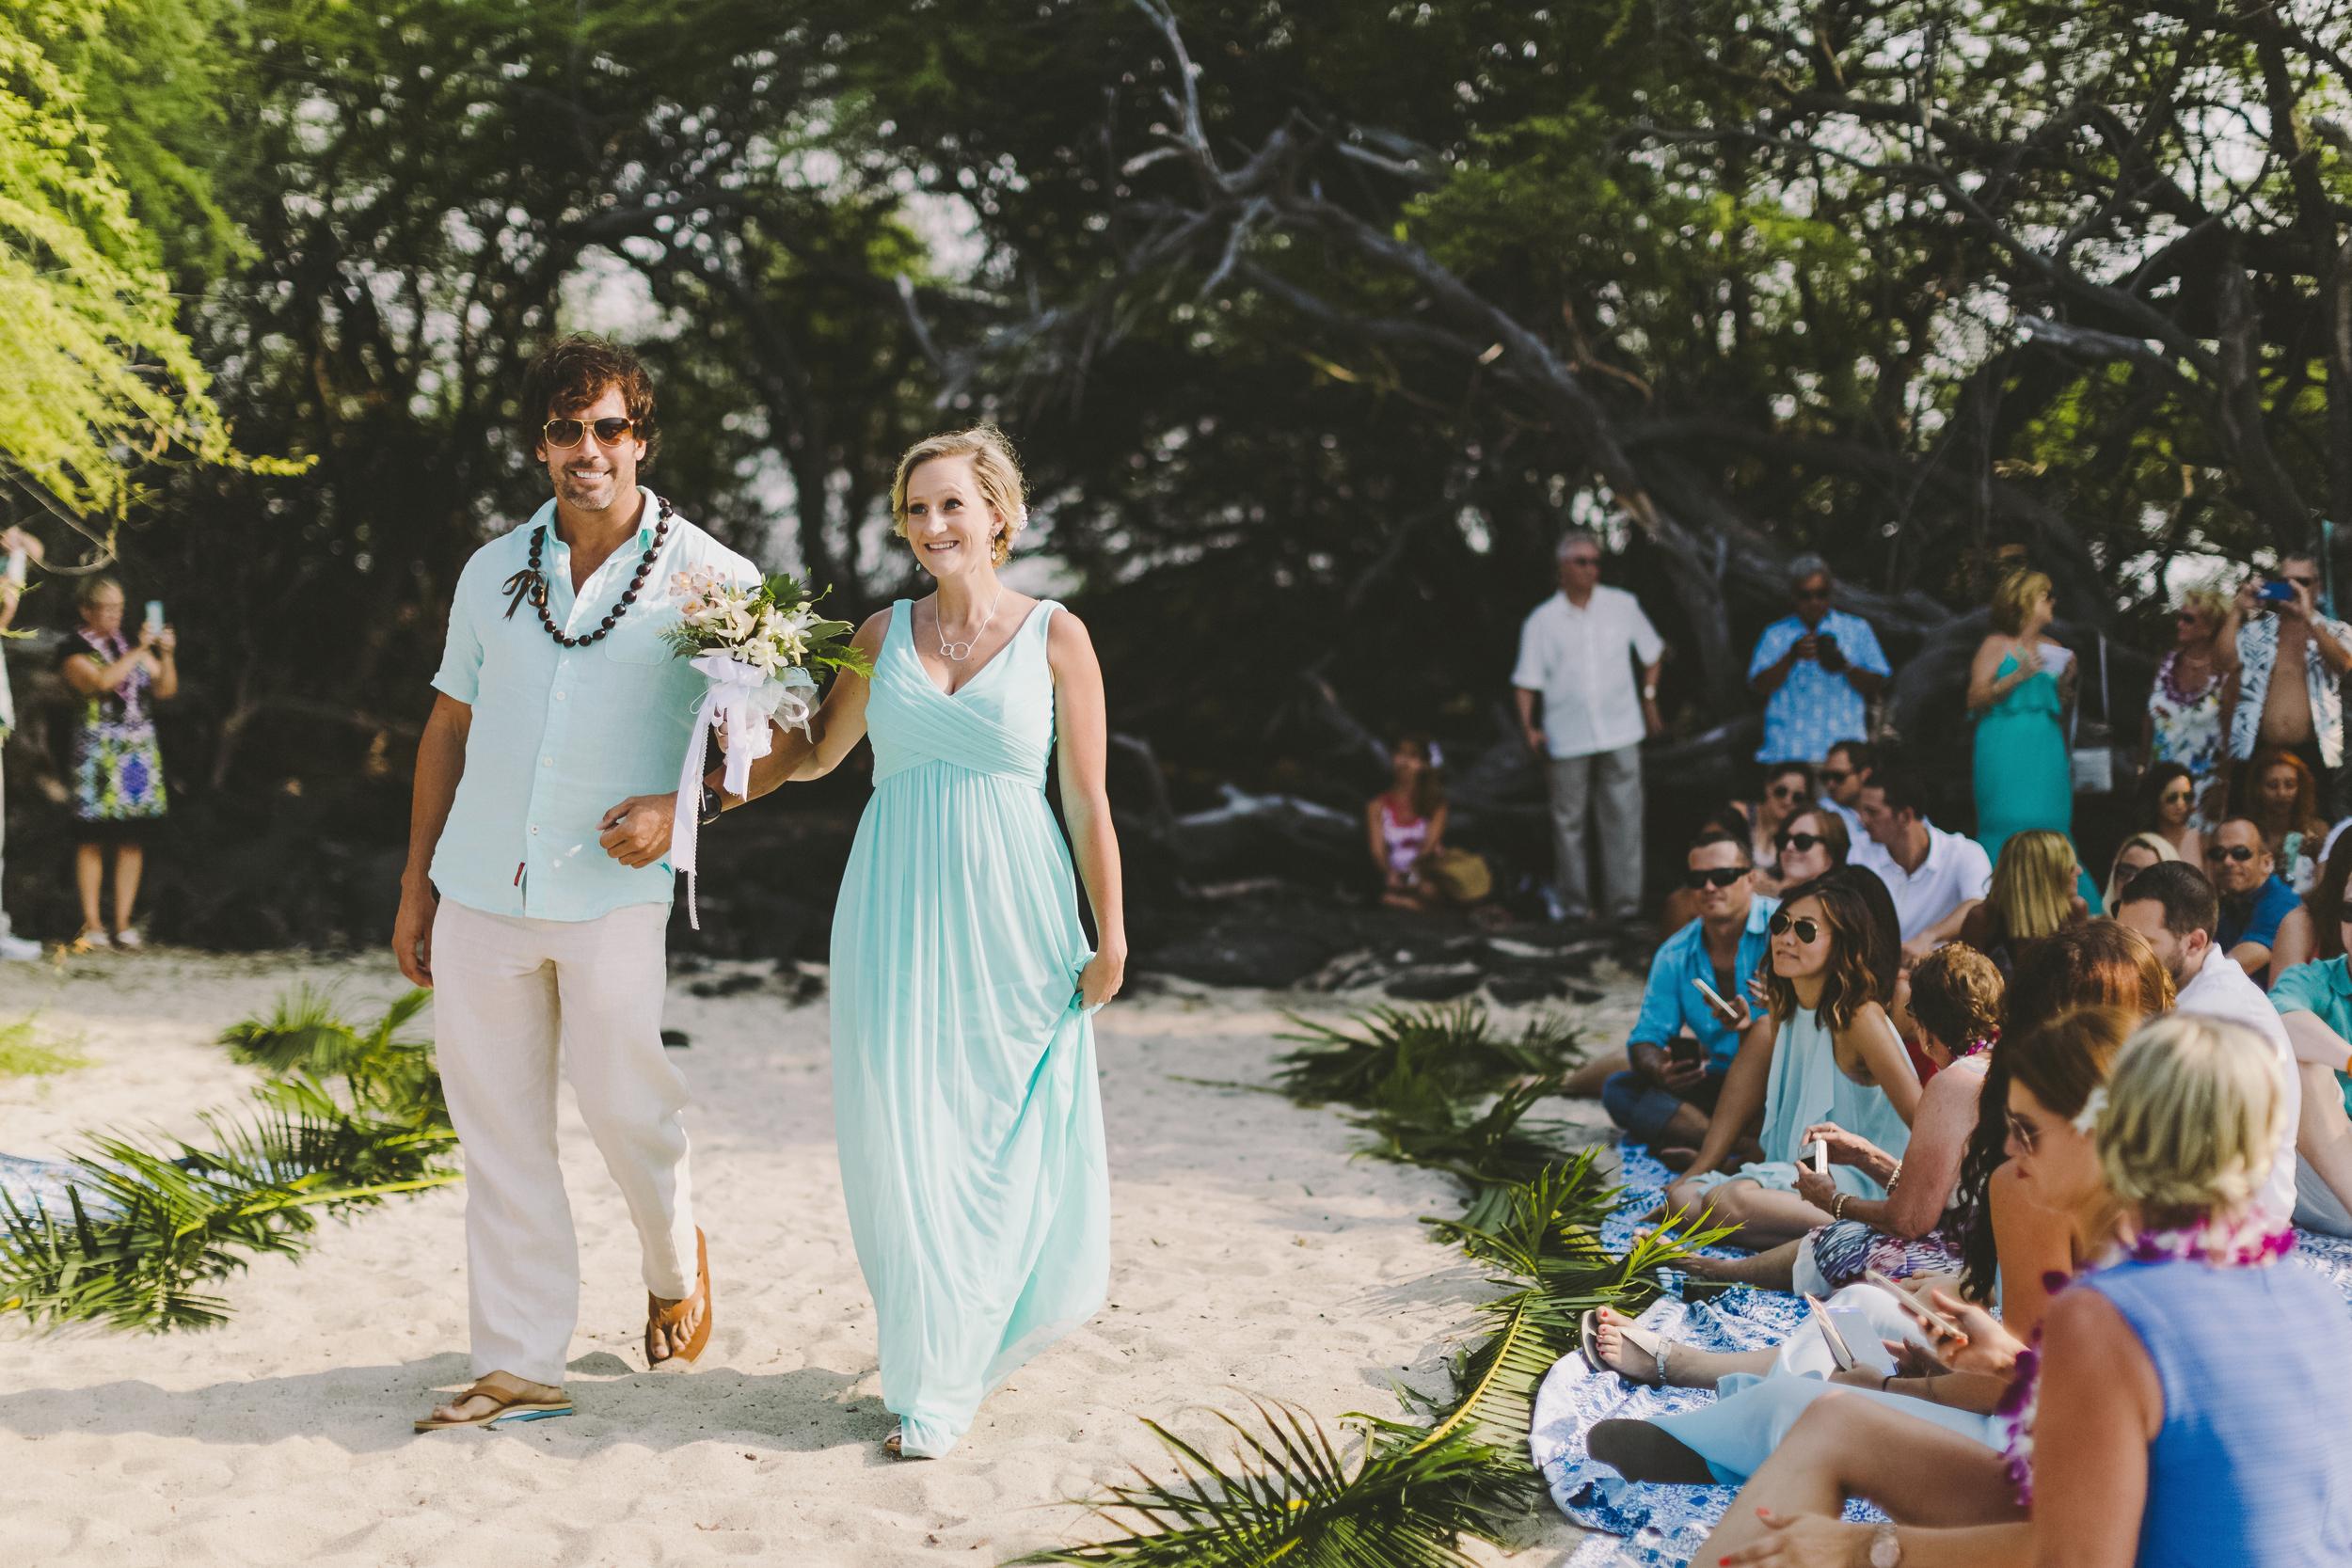 angie-diaz-photography-hawaii-wedding-photographer-kelli-jay-50.jpg